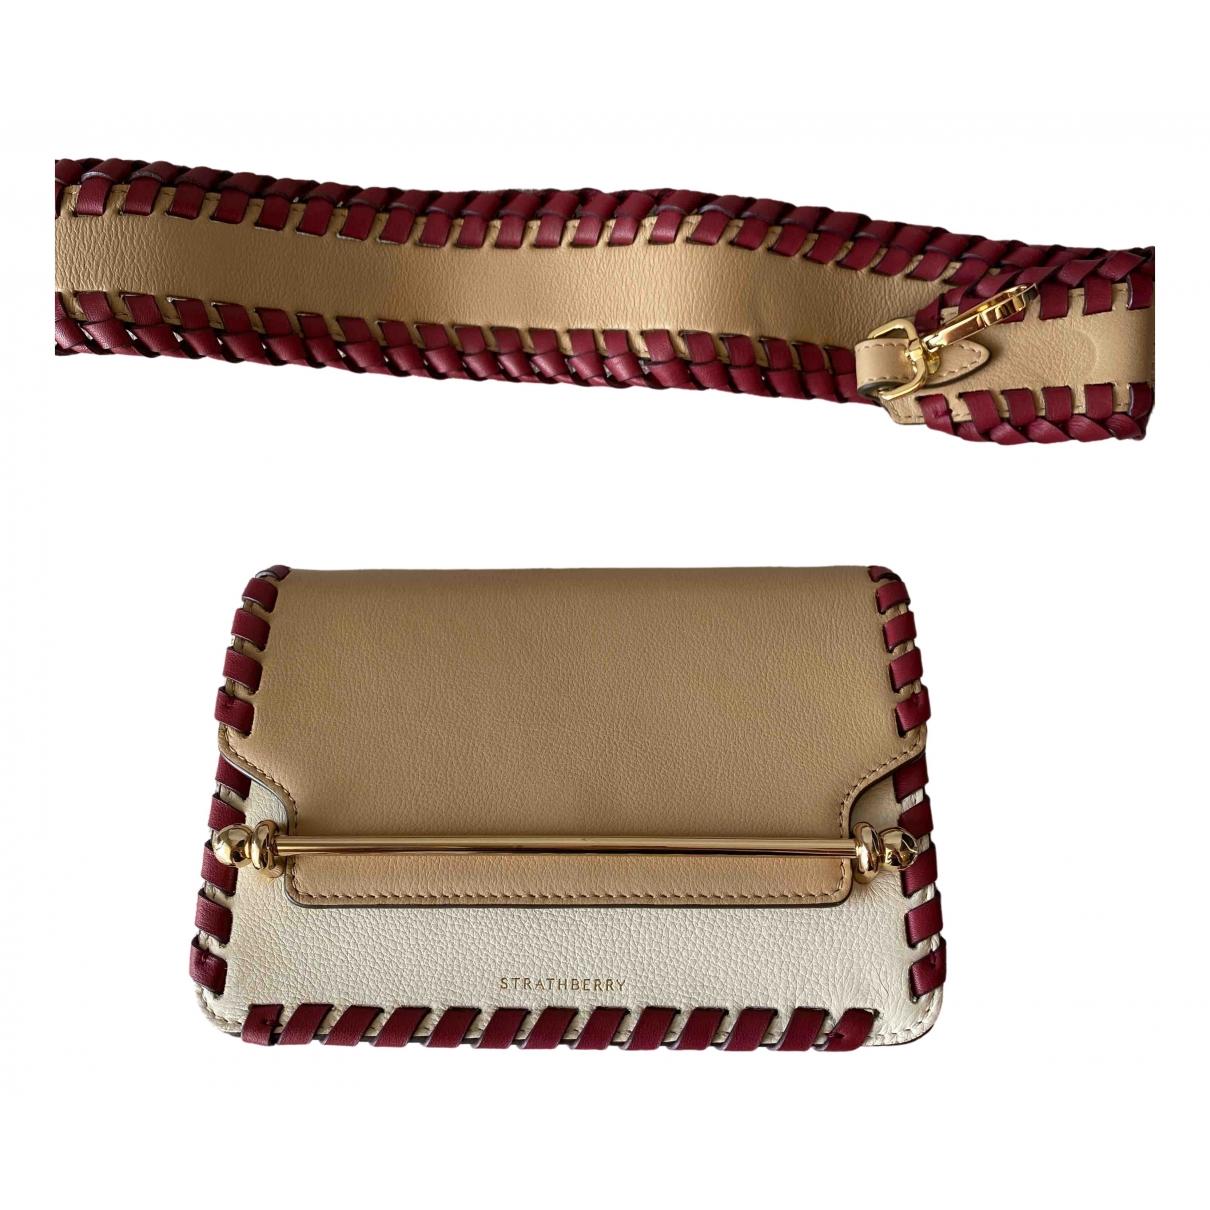 Strathberry \N Beige Leather handbag for Women \N